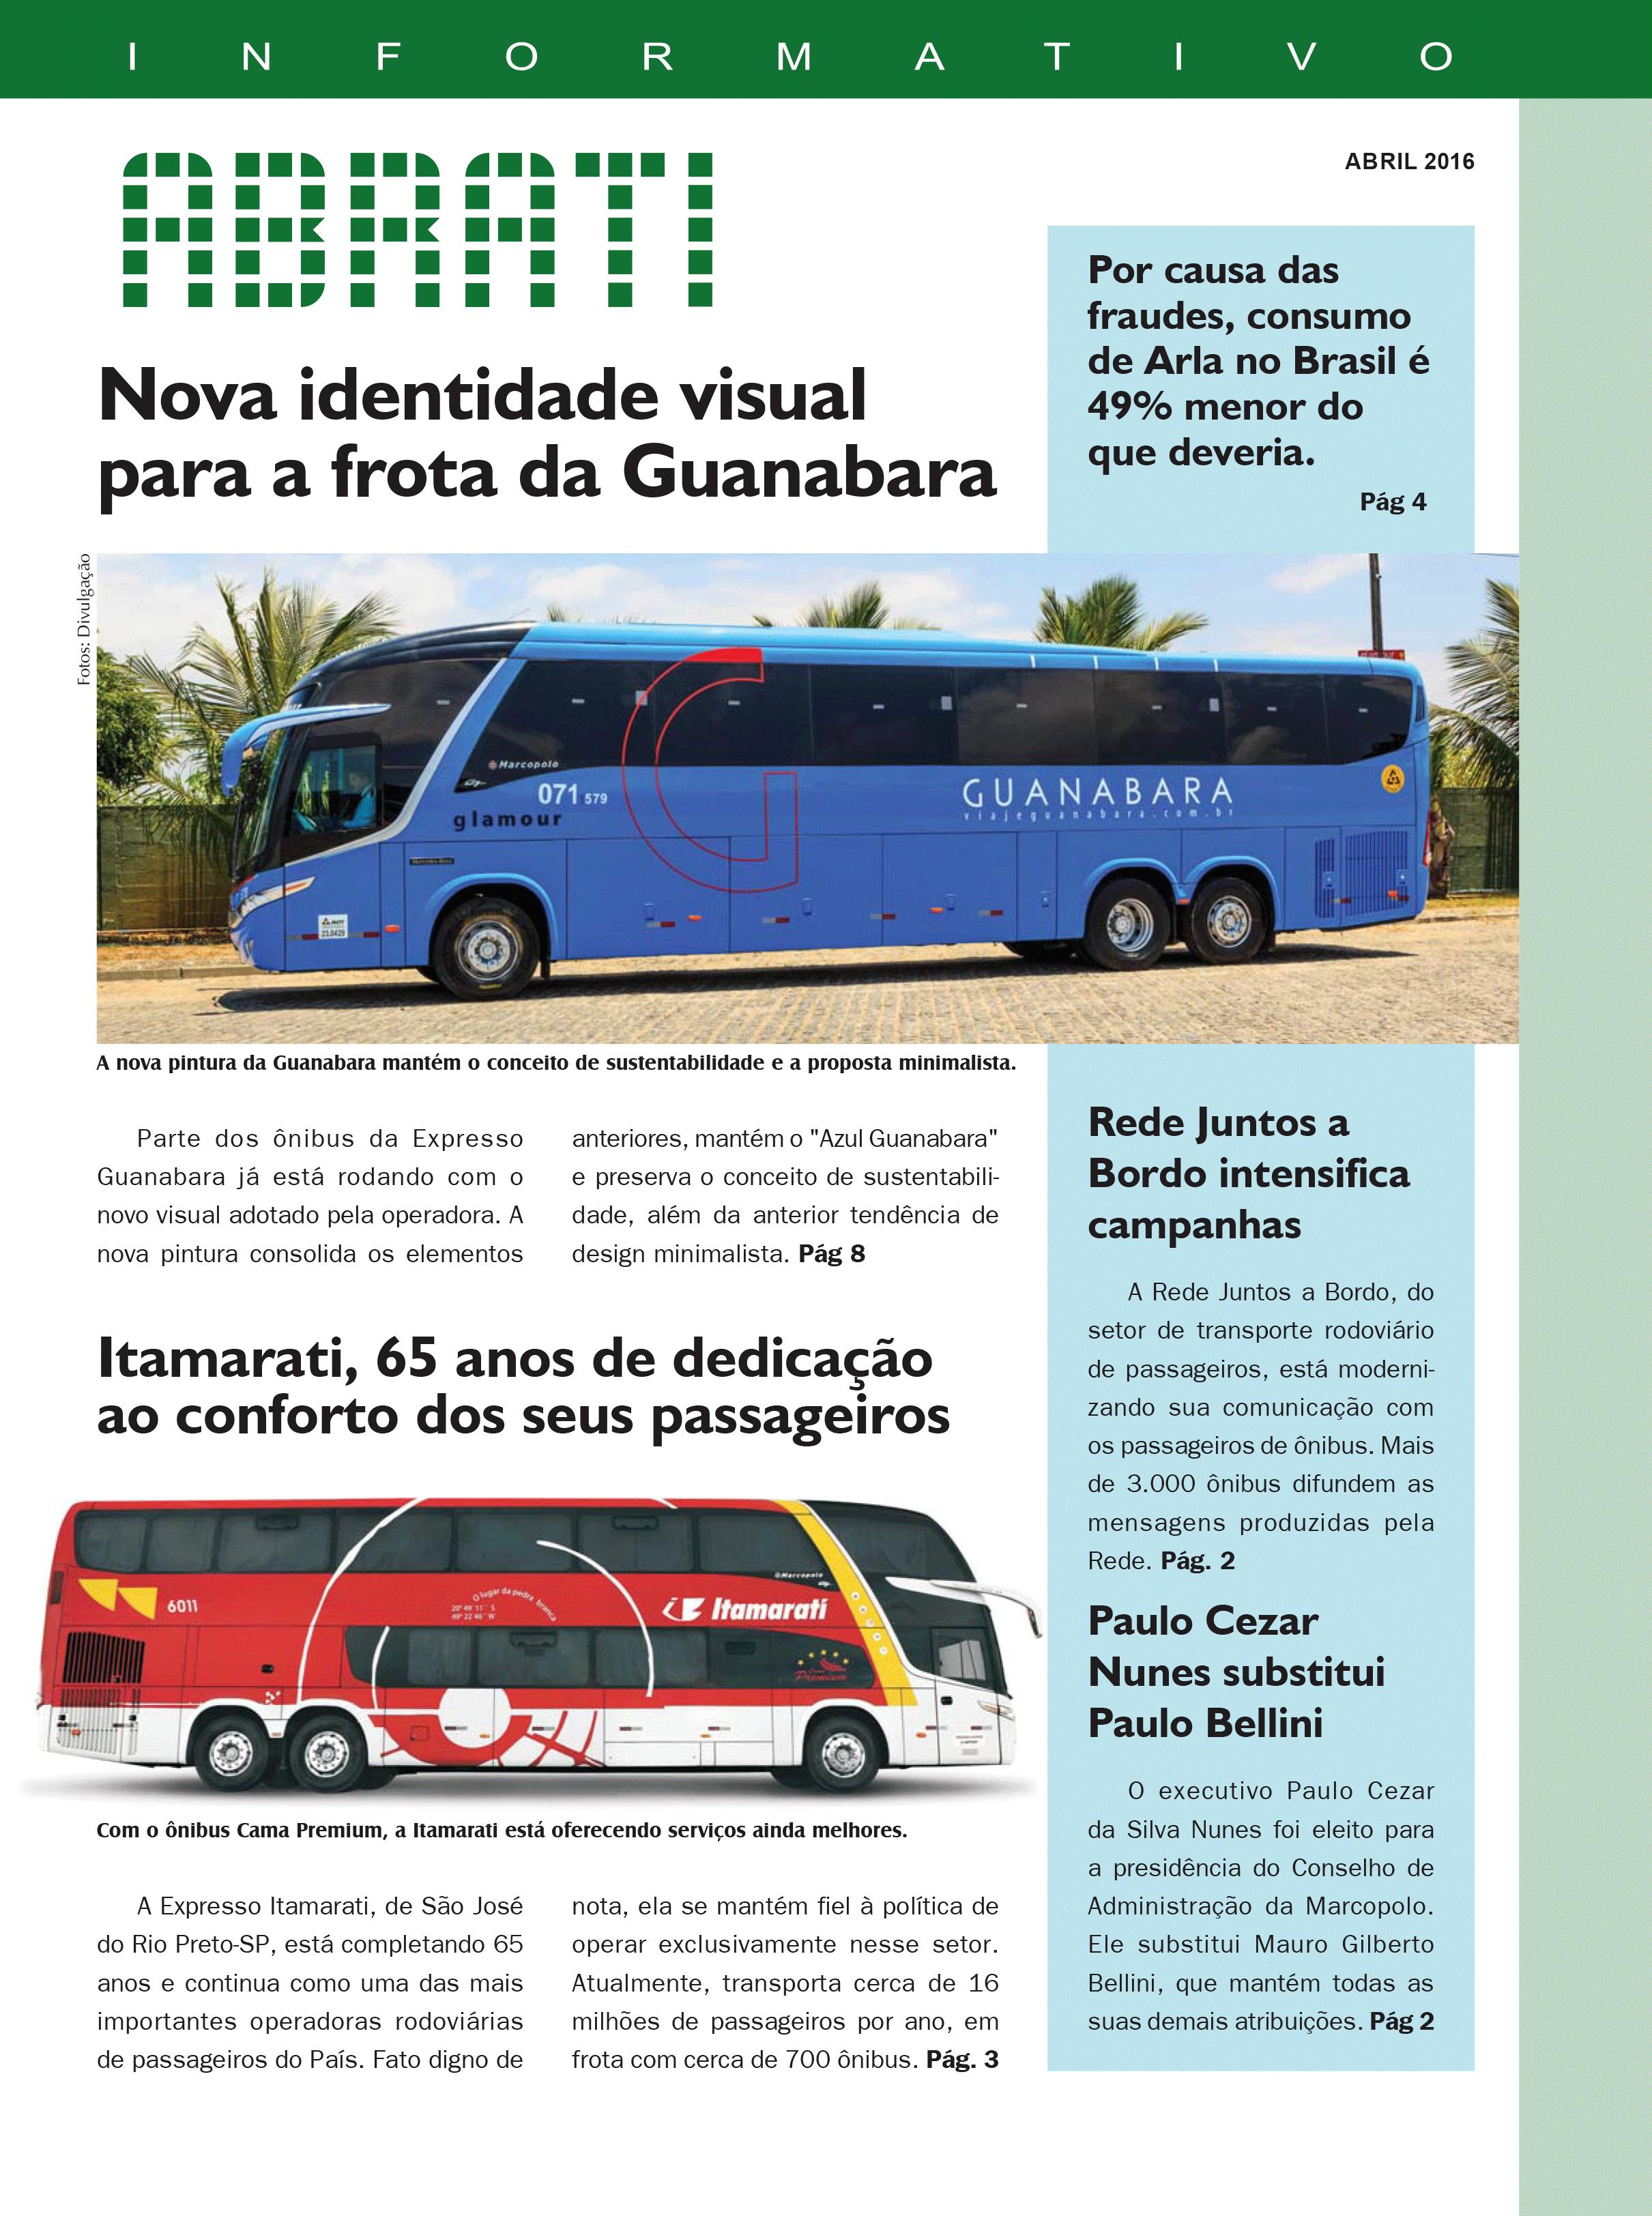 Informativo Abril 2016